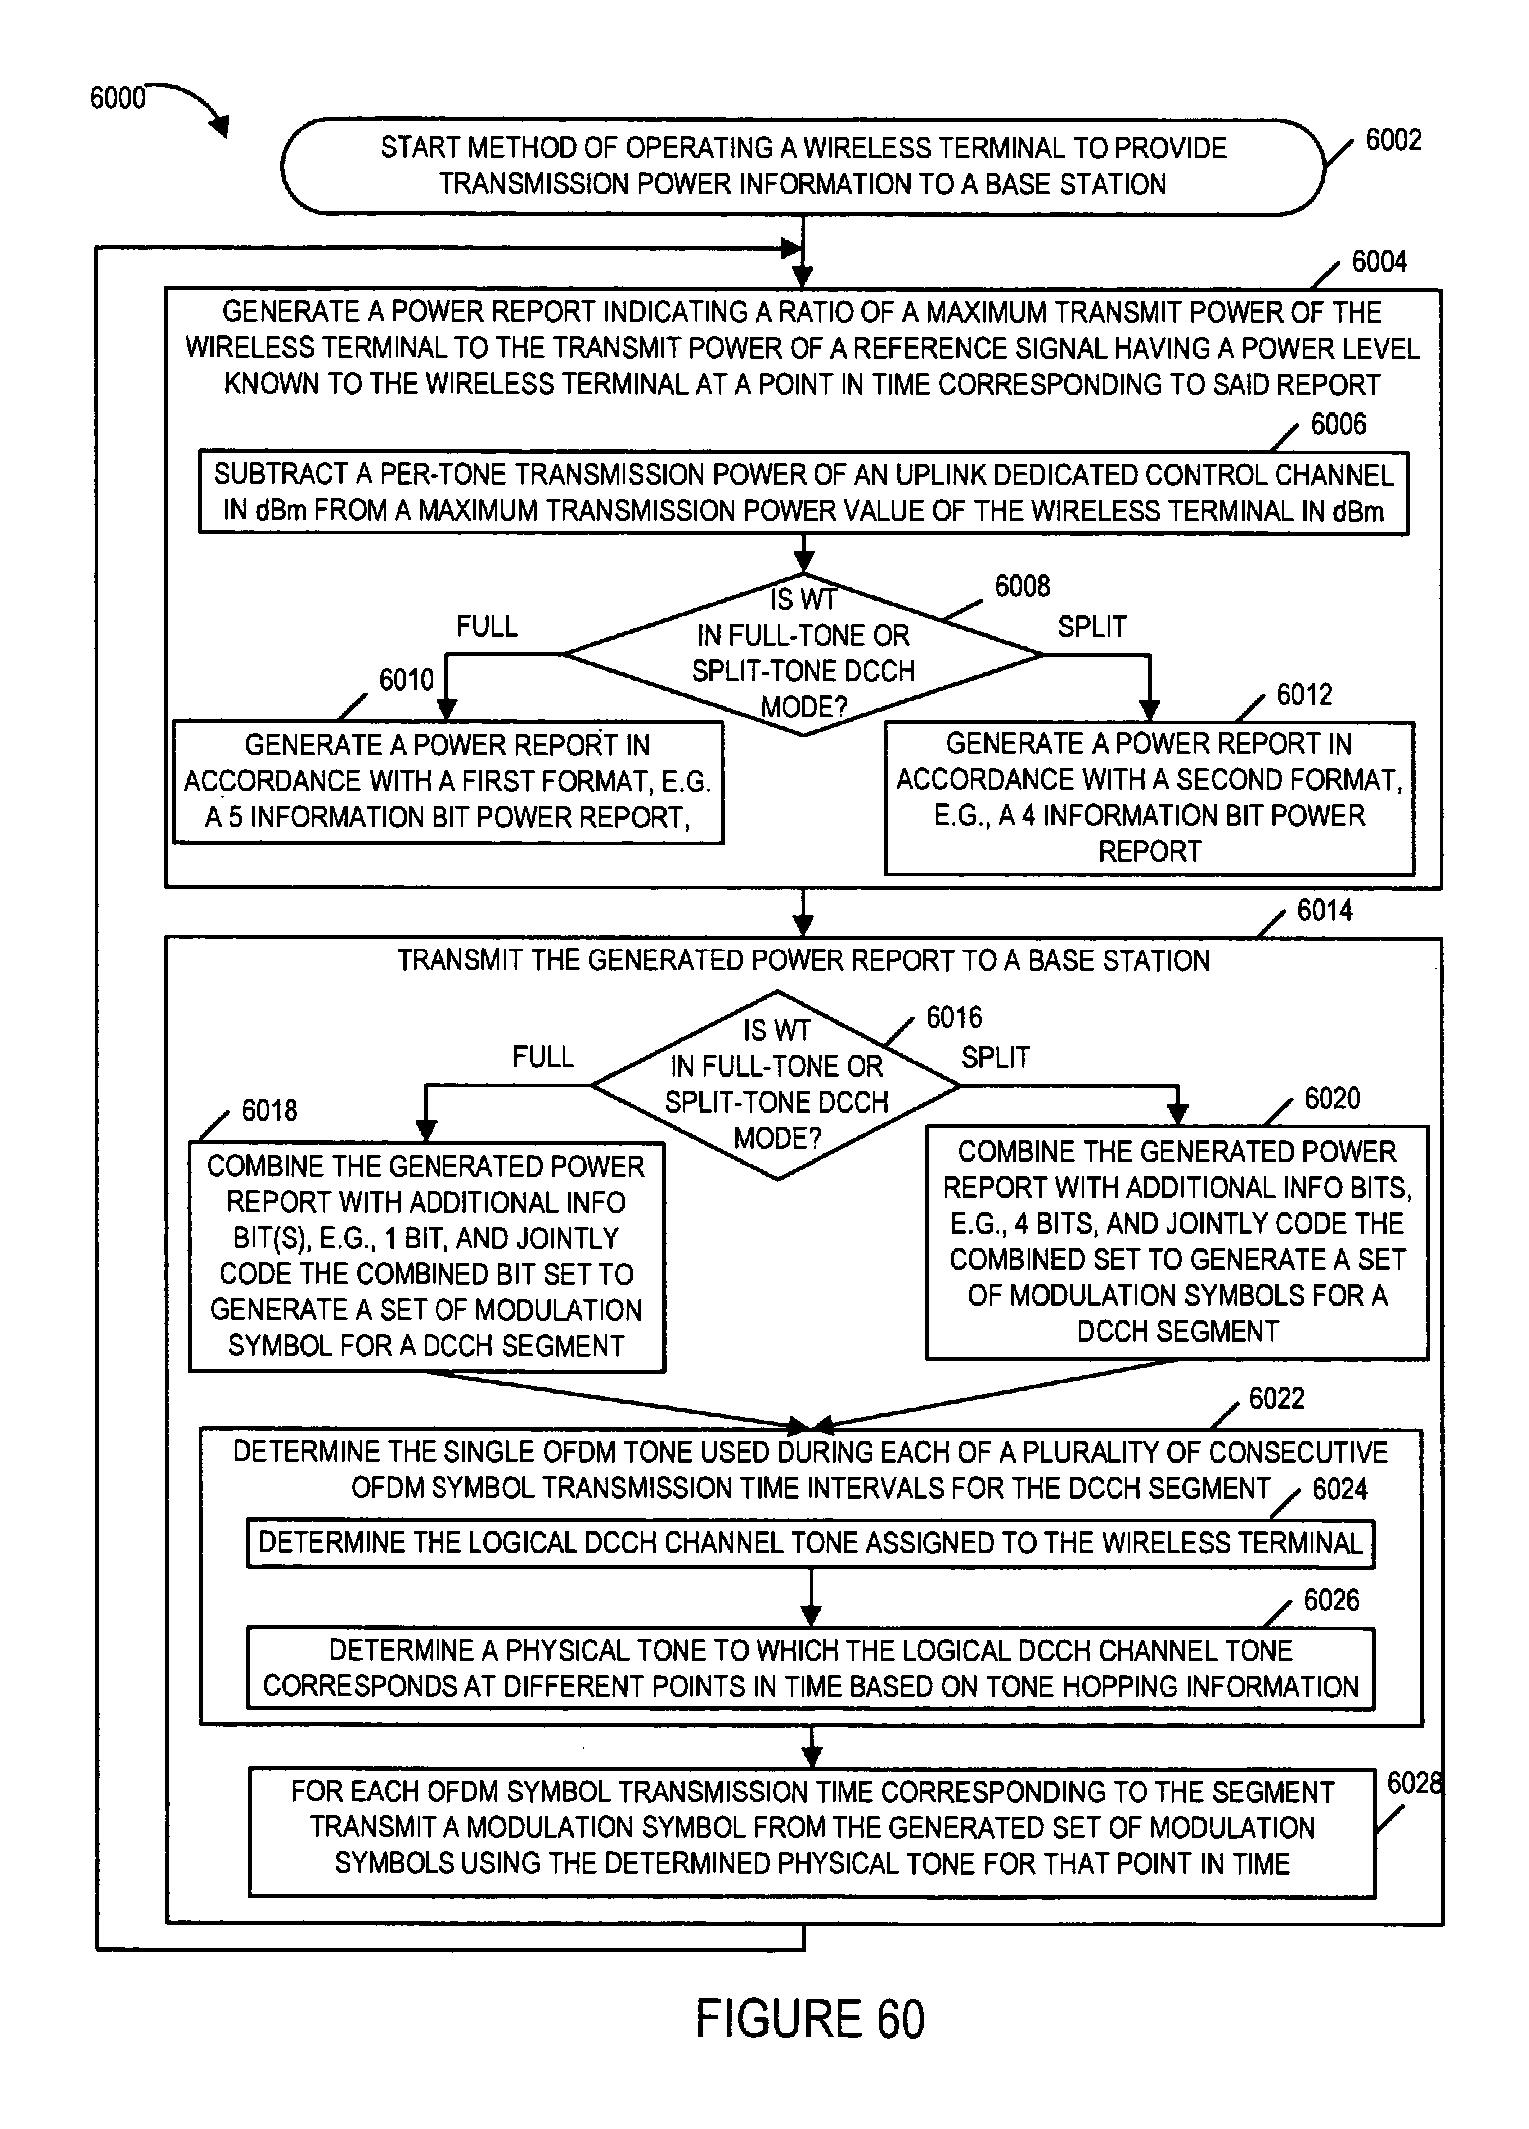 Patent US 9,893,917 B2